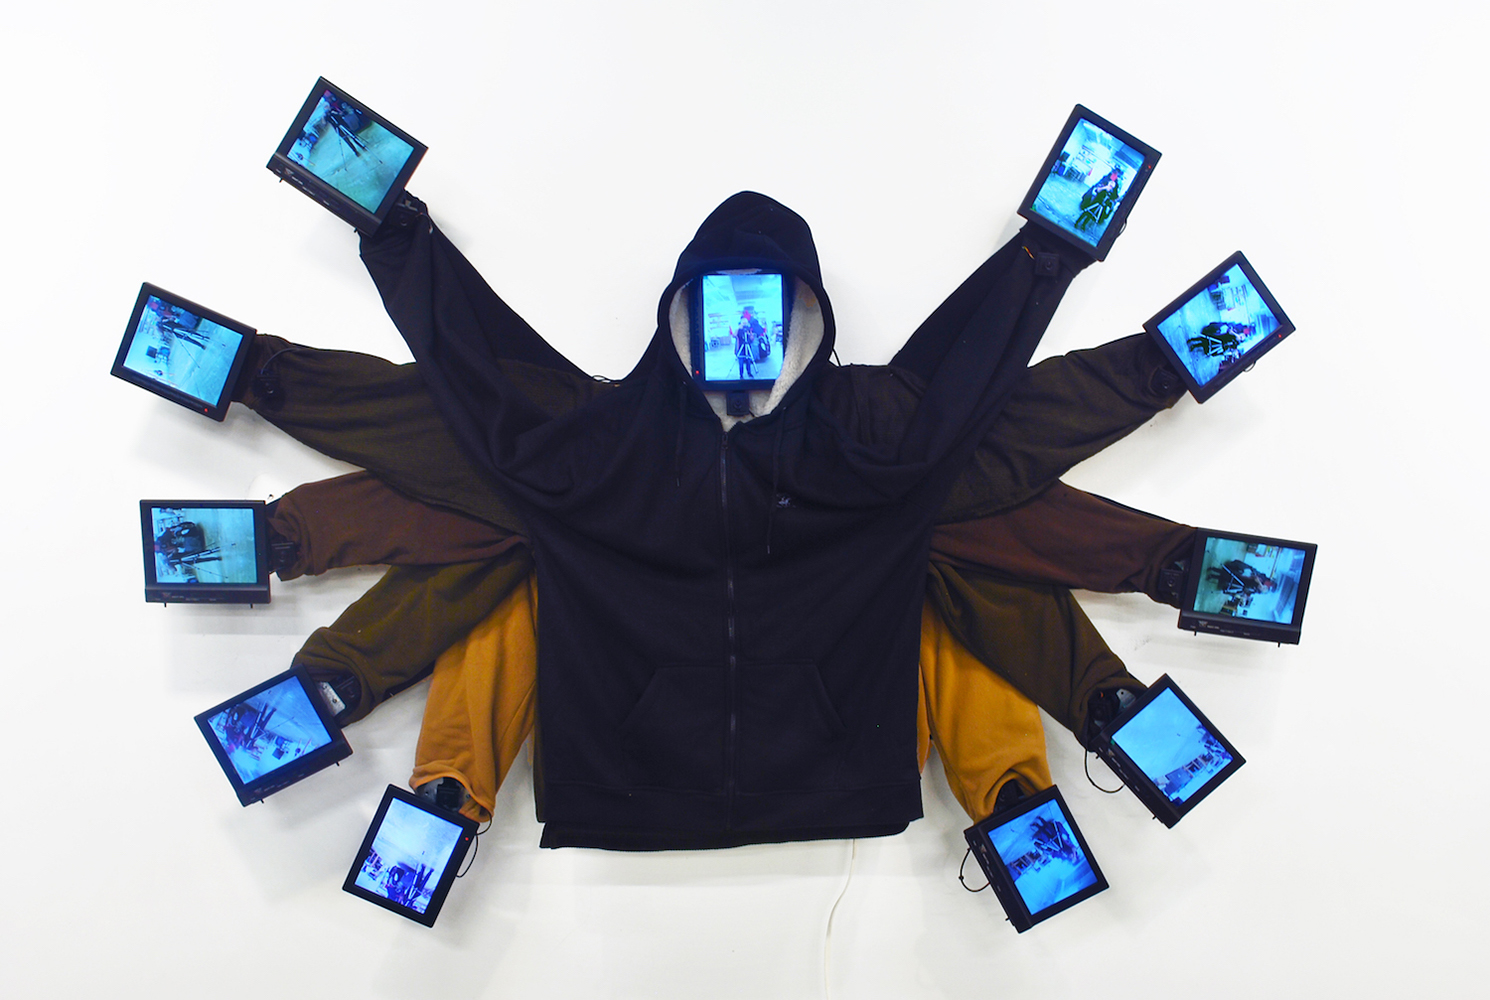 """Black Angel,"" video installation social sculpture, 2016. Mixed media, video cameras and monitors. Size: 72"" w x 12"" d. https://vimeopro.com/fuzeart/black-angel"